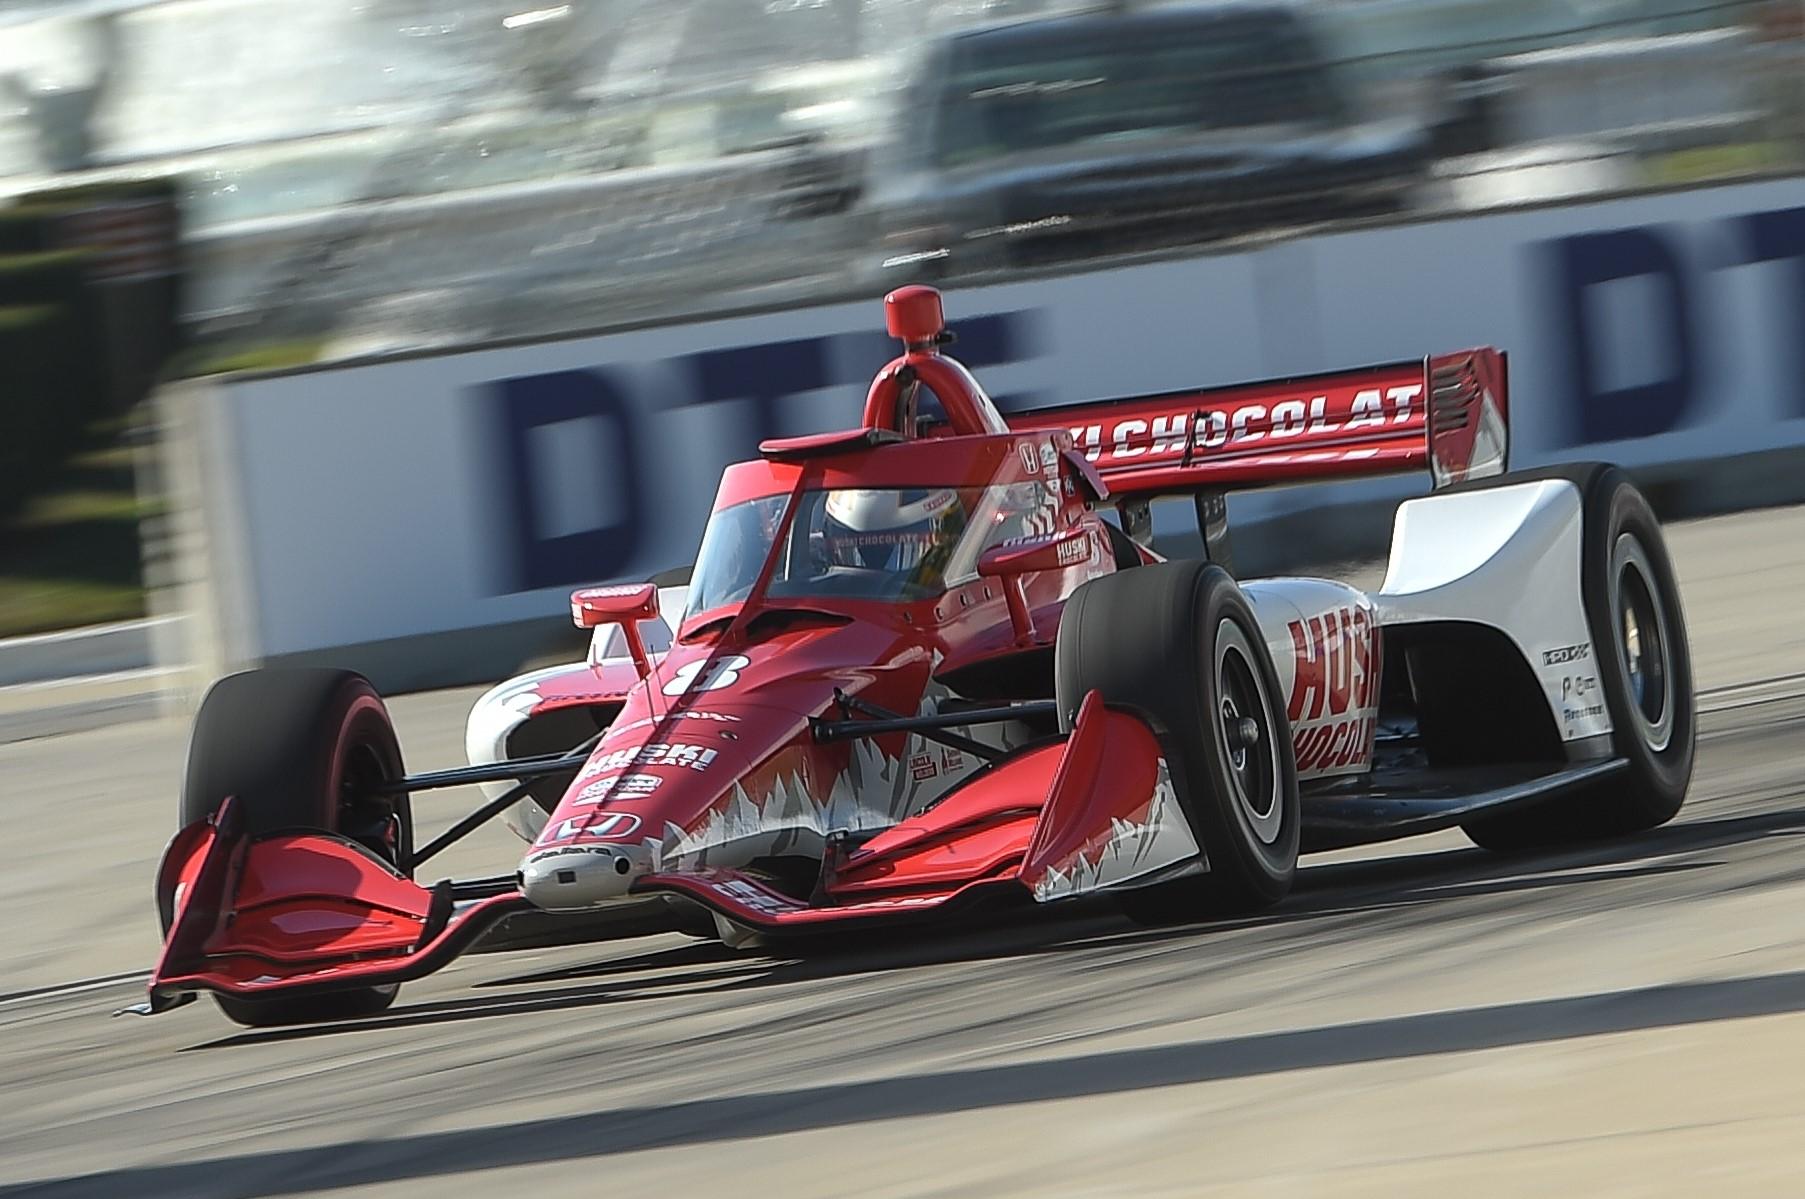 Heartbreak for Power as Ericsson snags first IndyCar win - Speedcafe